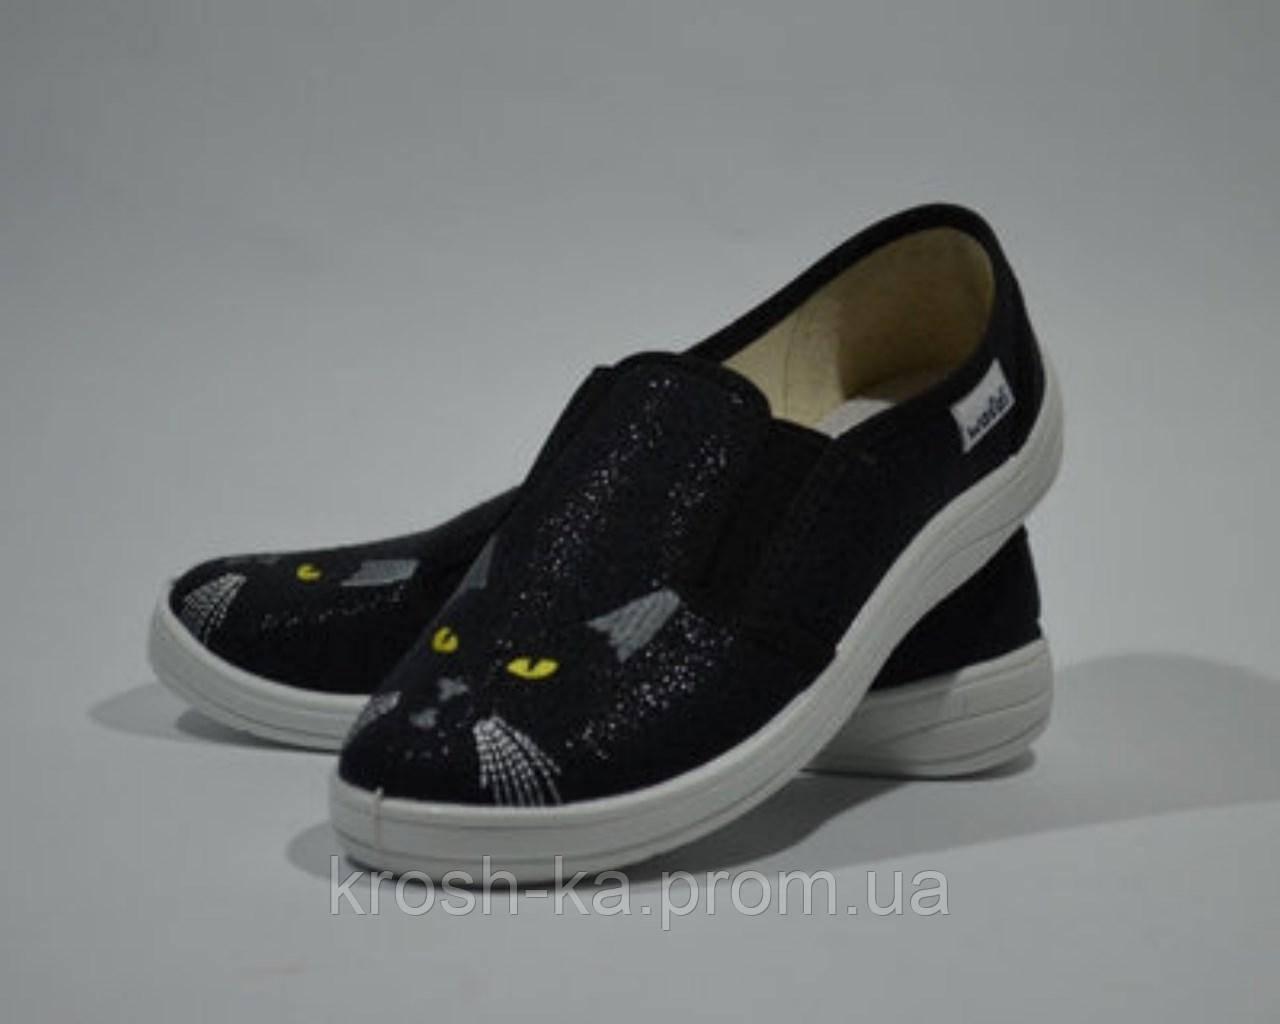 Тапочки для девочки Вика (30-36)р котики Waldi Украина чёрный 6229\51-495